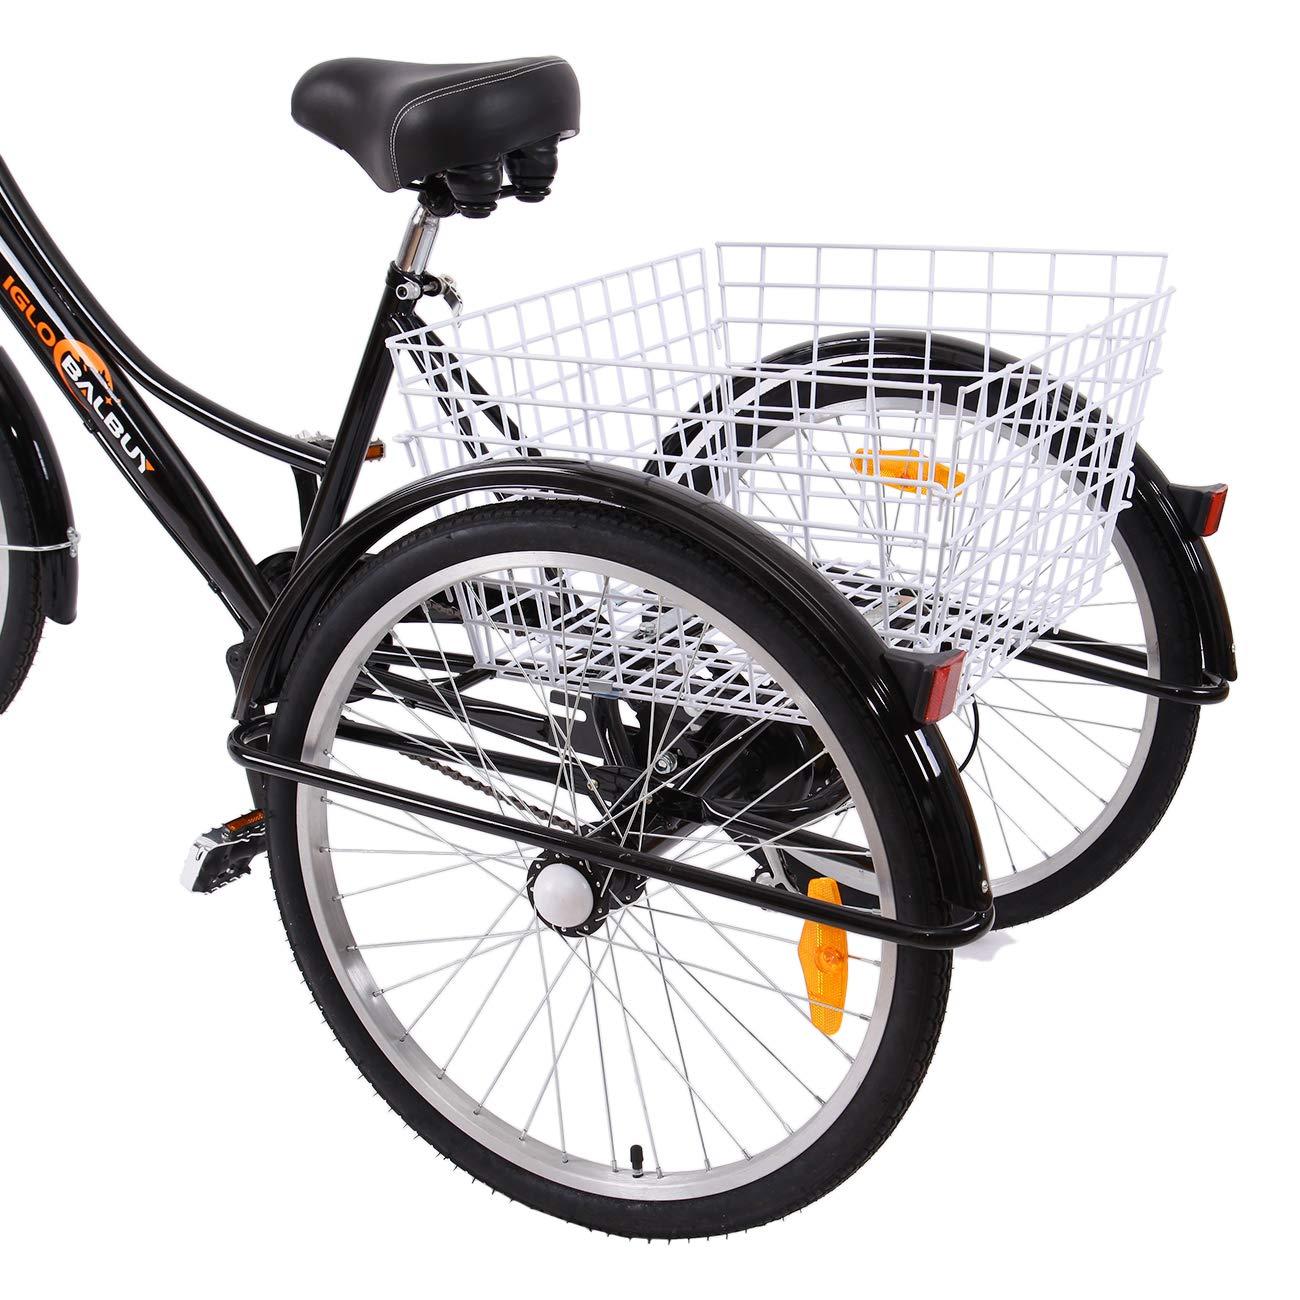 Yonntech Triciclo per Adulti 04